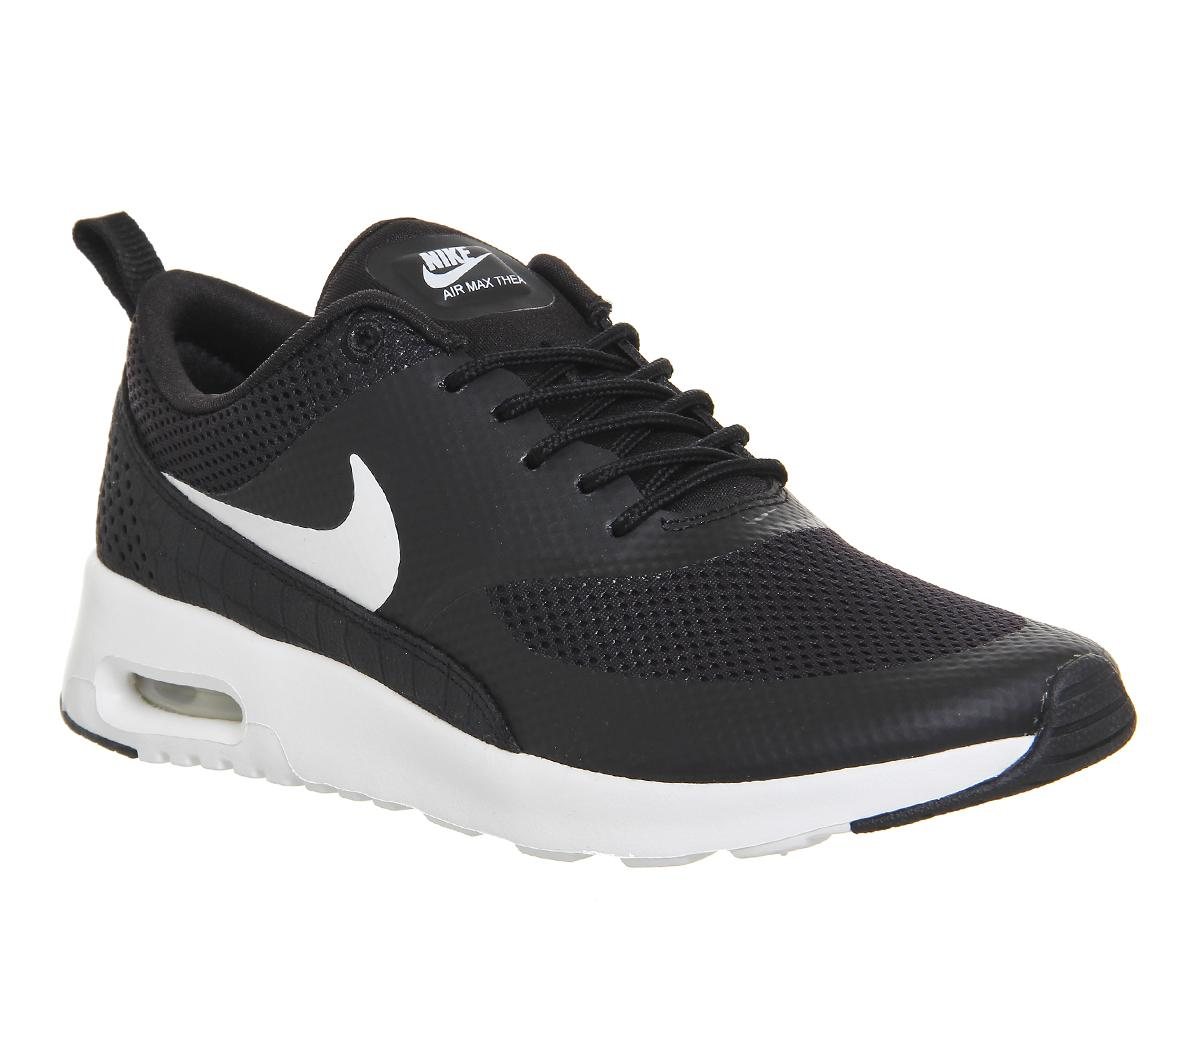 nike air max thea white junior, Nike Air Force 1 Low Mens